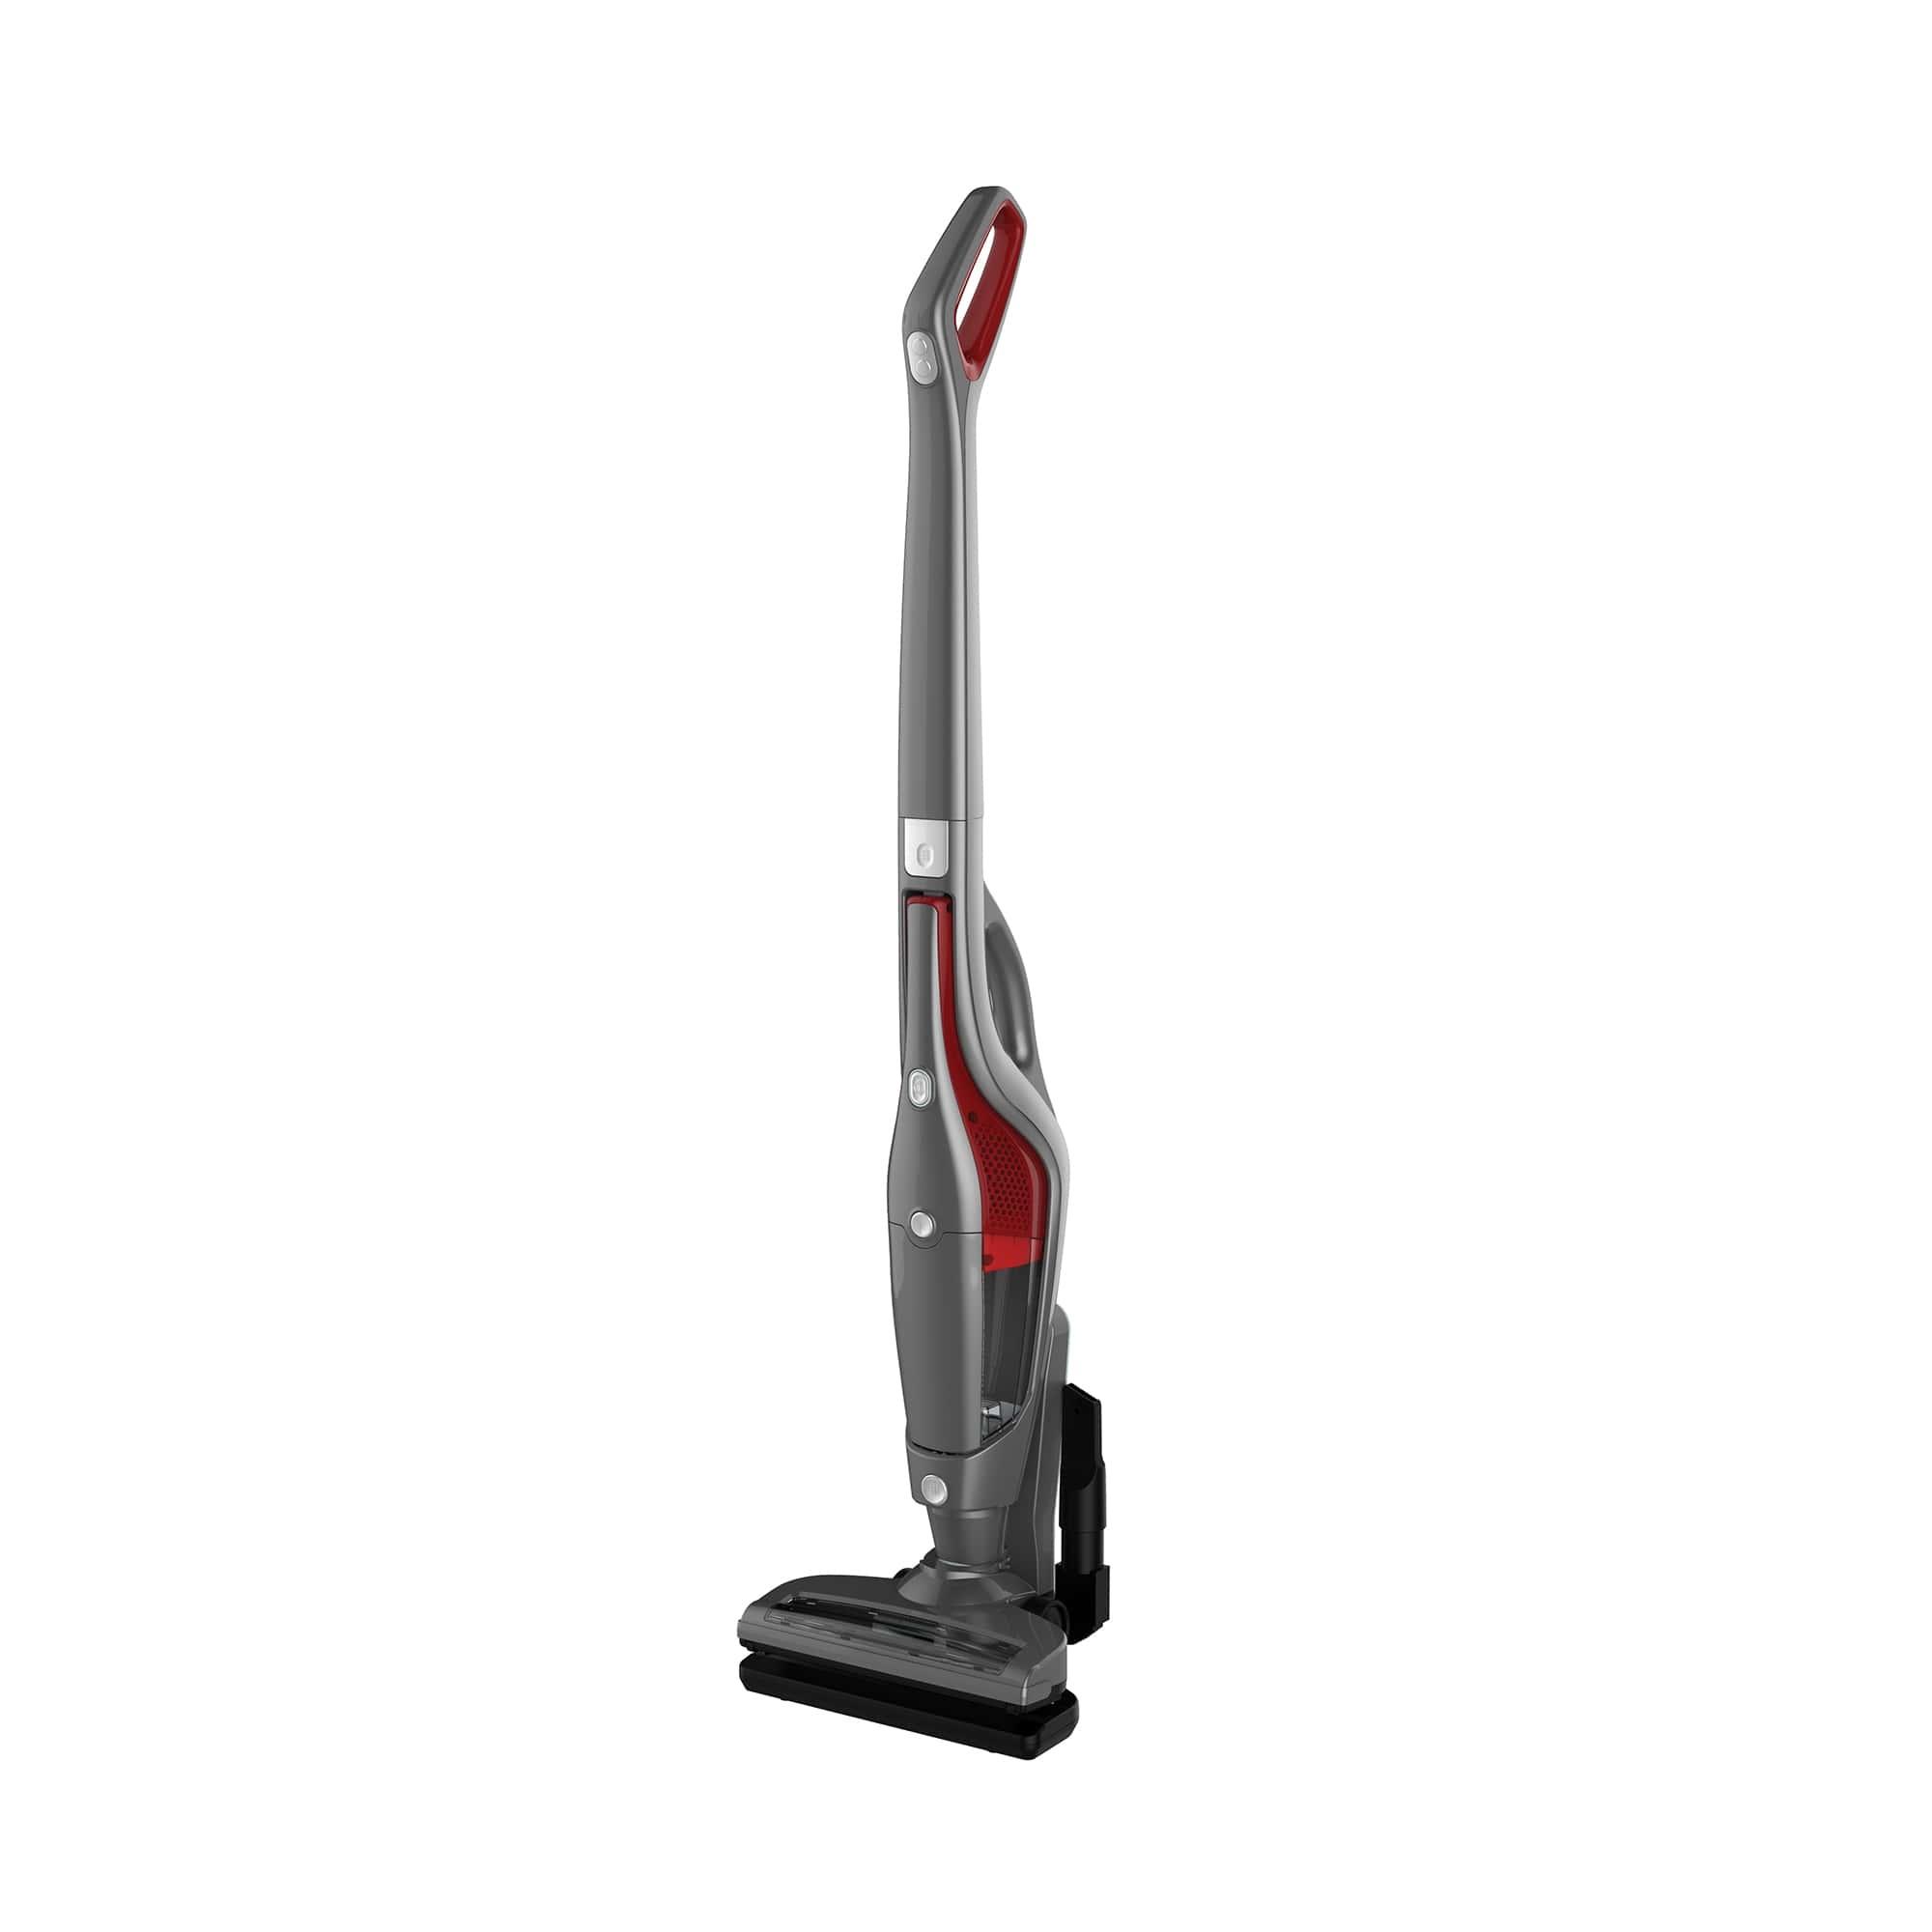 Midea Cordless Vacuum Cleaner MVC 14P GR 144 V 2 In 1